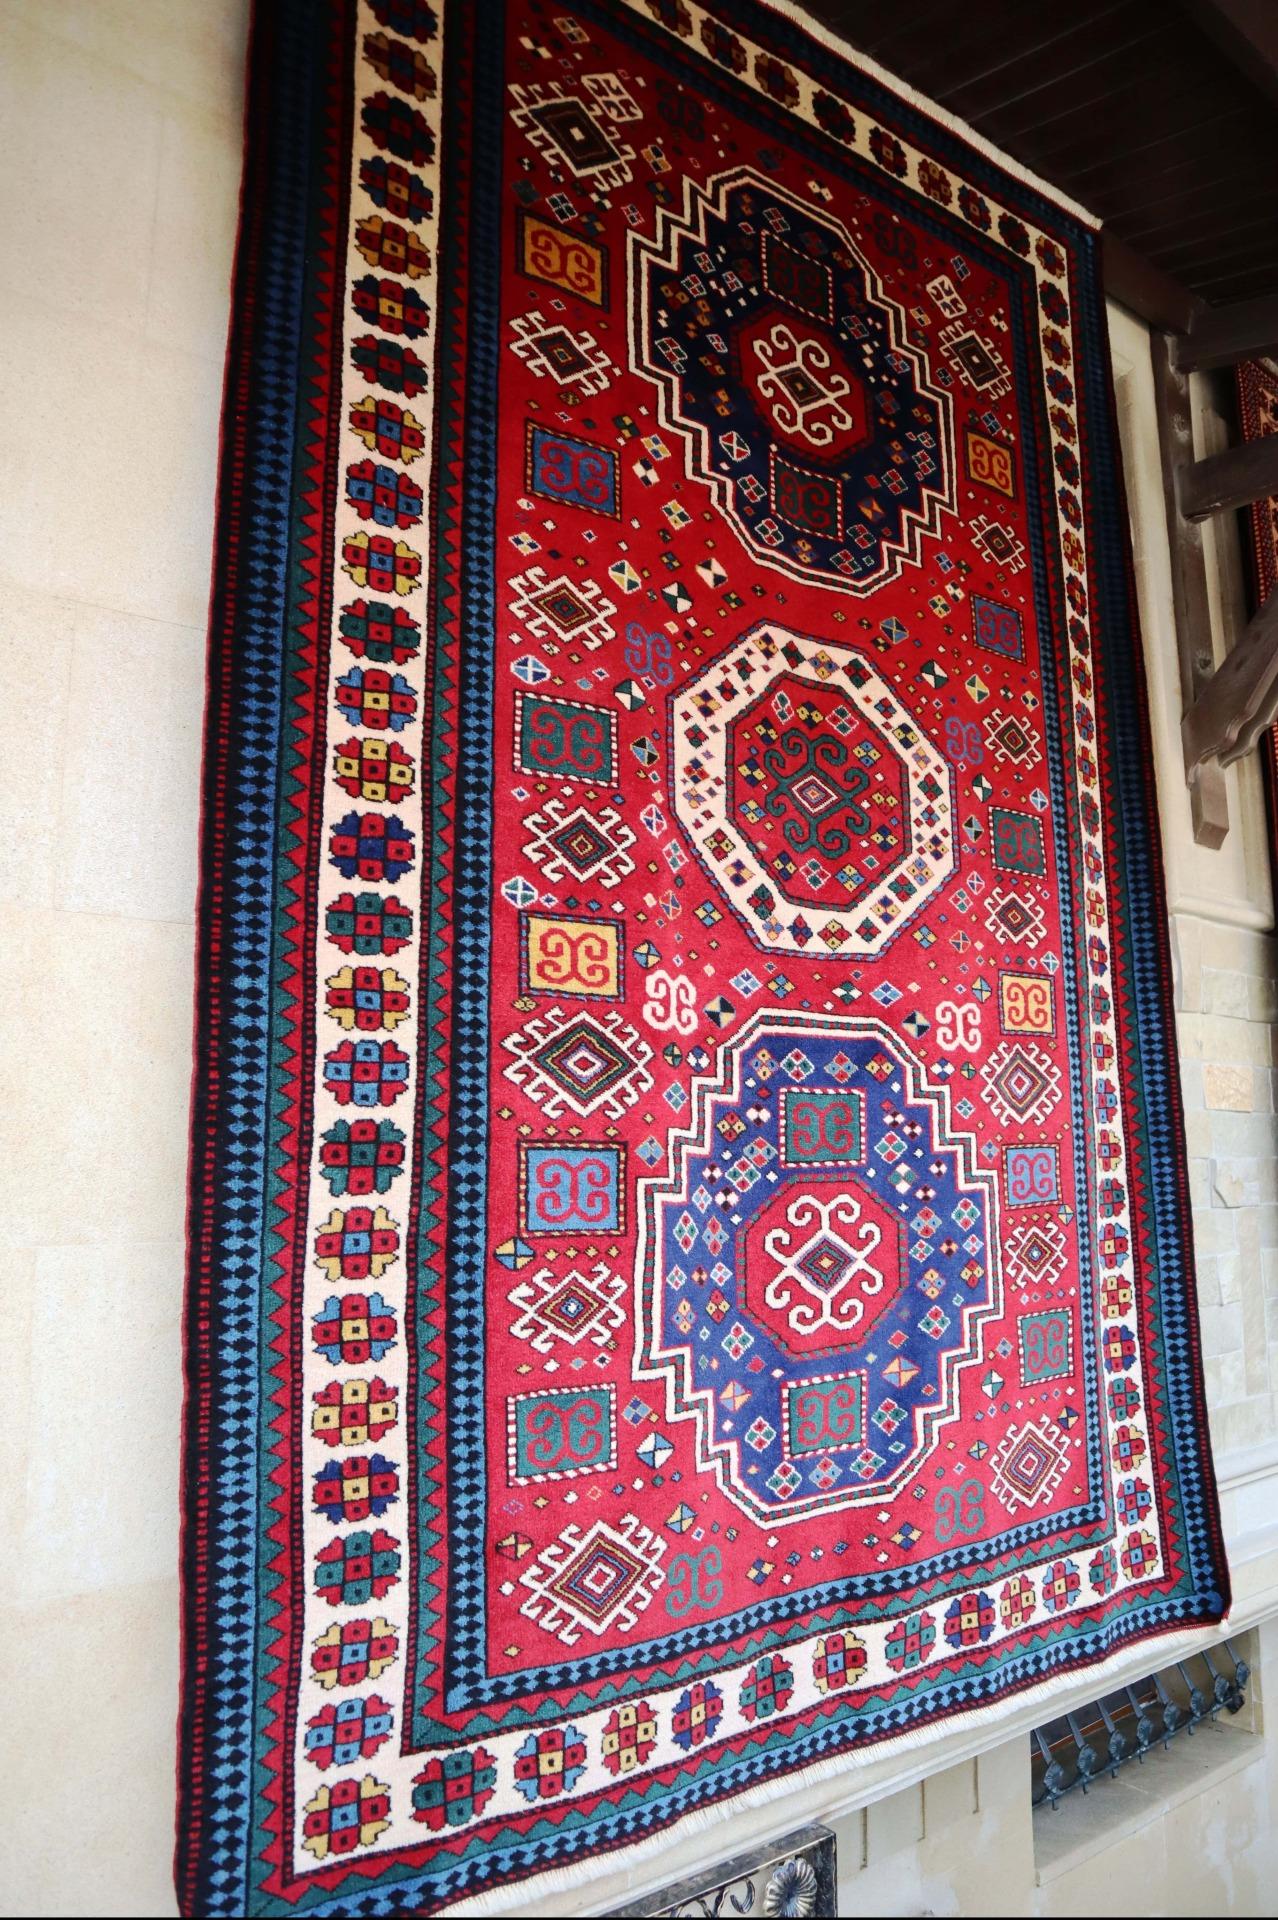 This handwoven silk carpet is among the many that adorn Azər-İlmə premises.